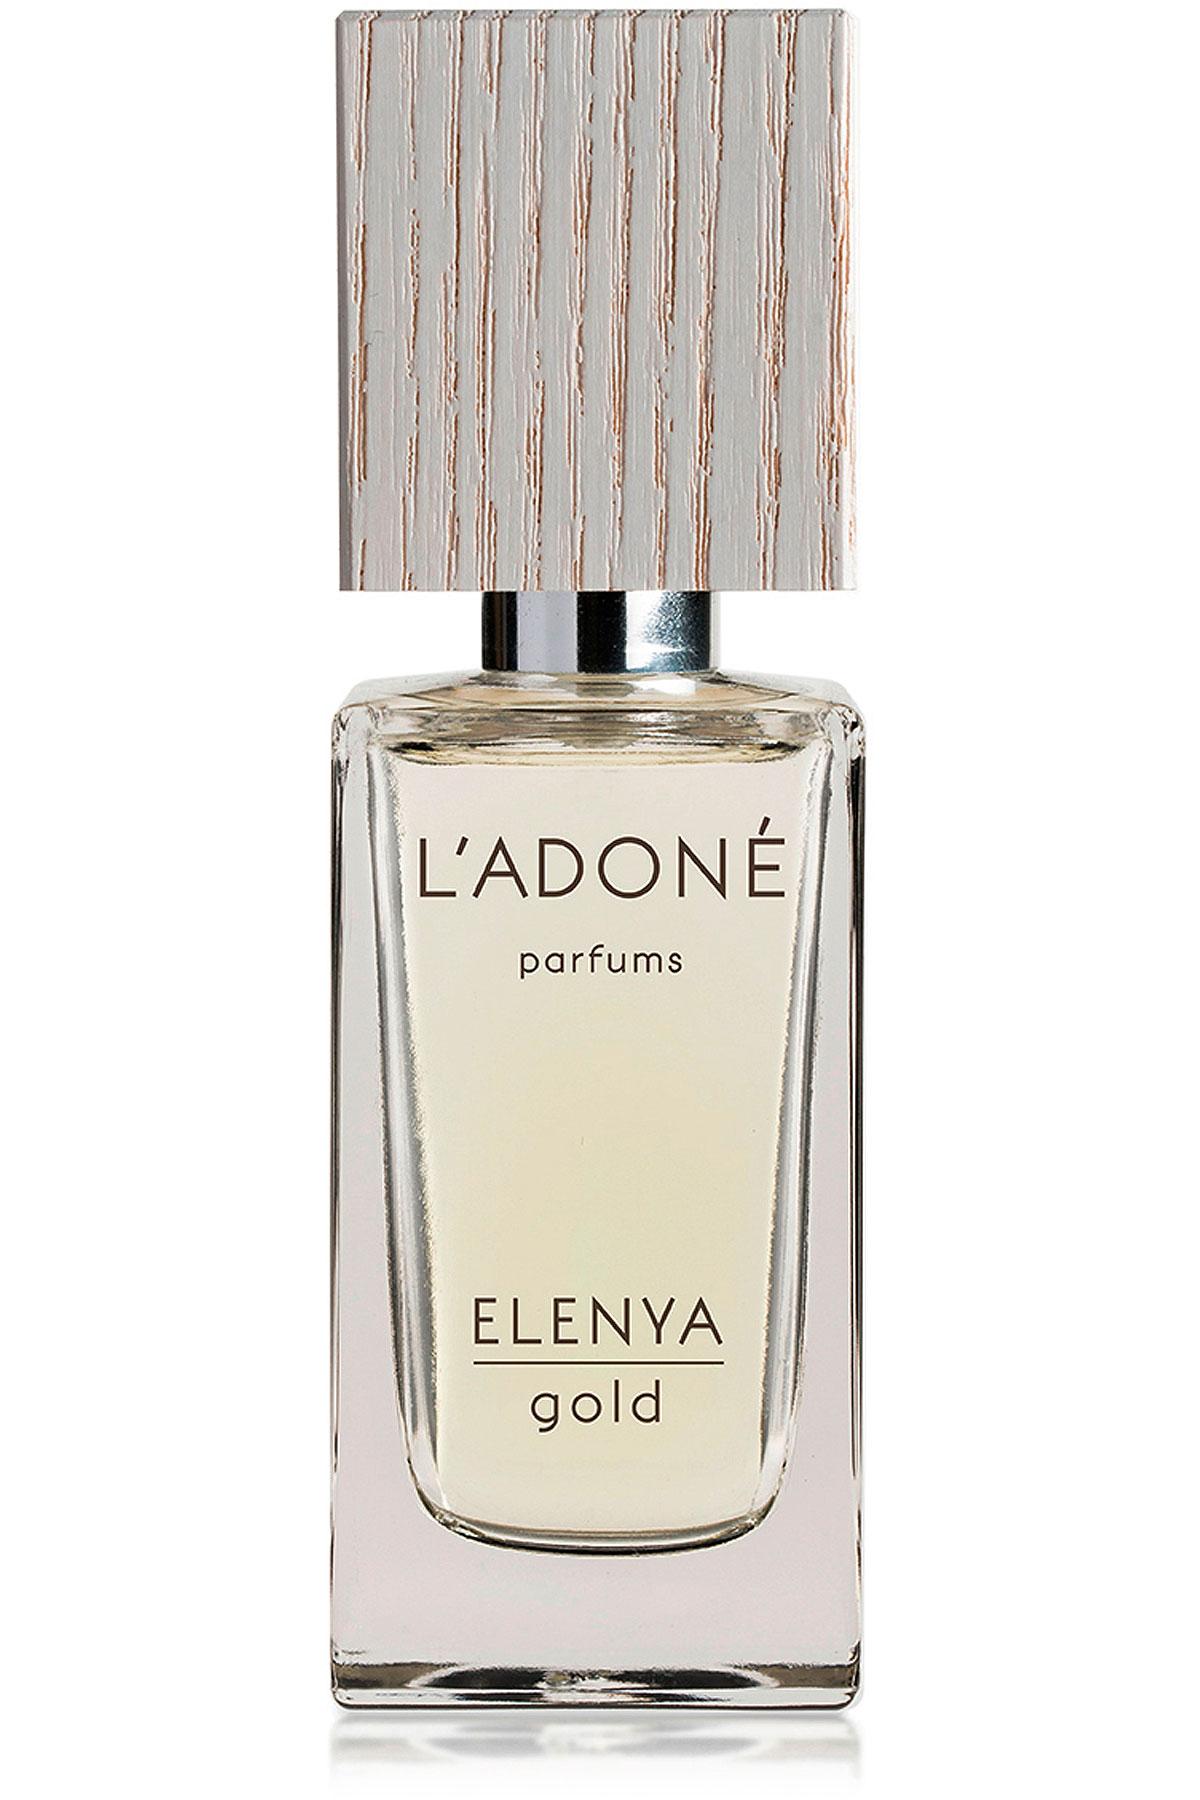 Elenya Gold Extrait De Parfum 50 Ml Mens Fragrances L Adone